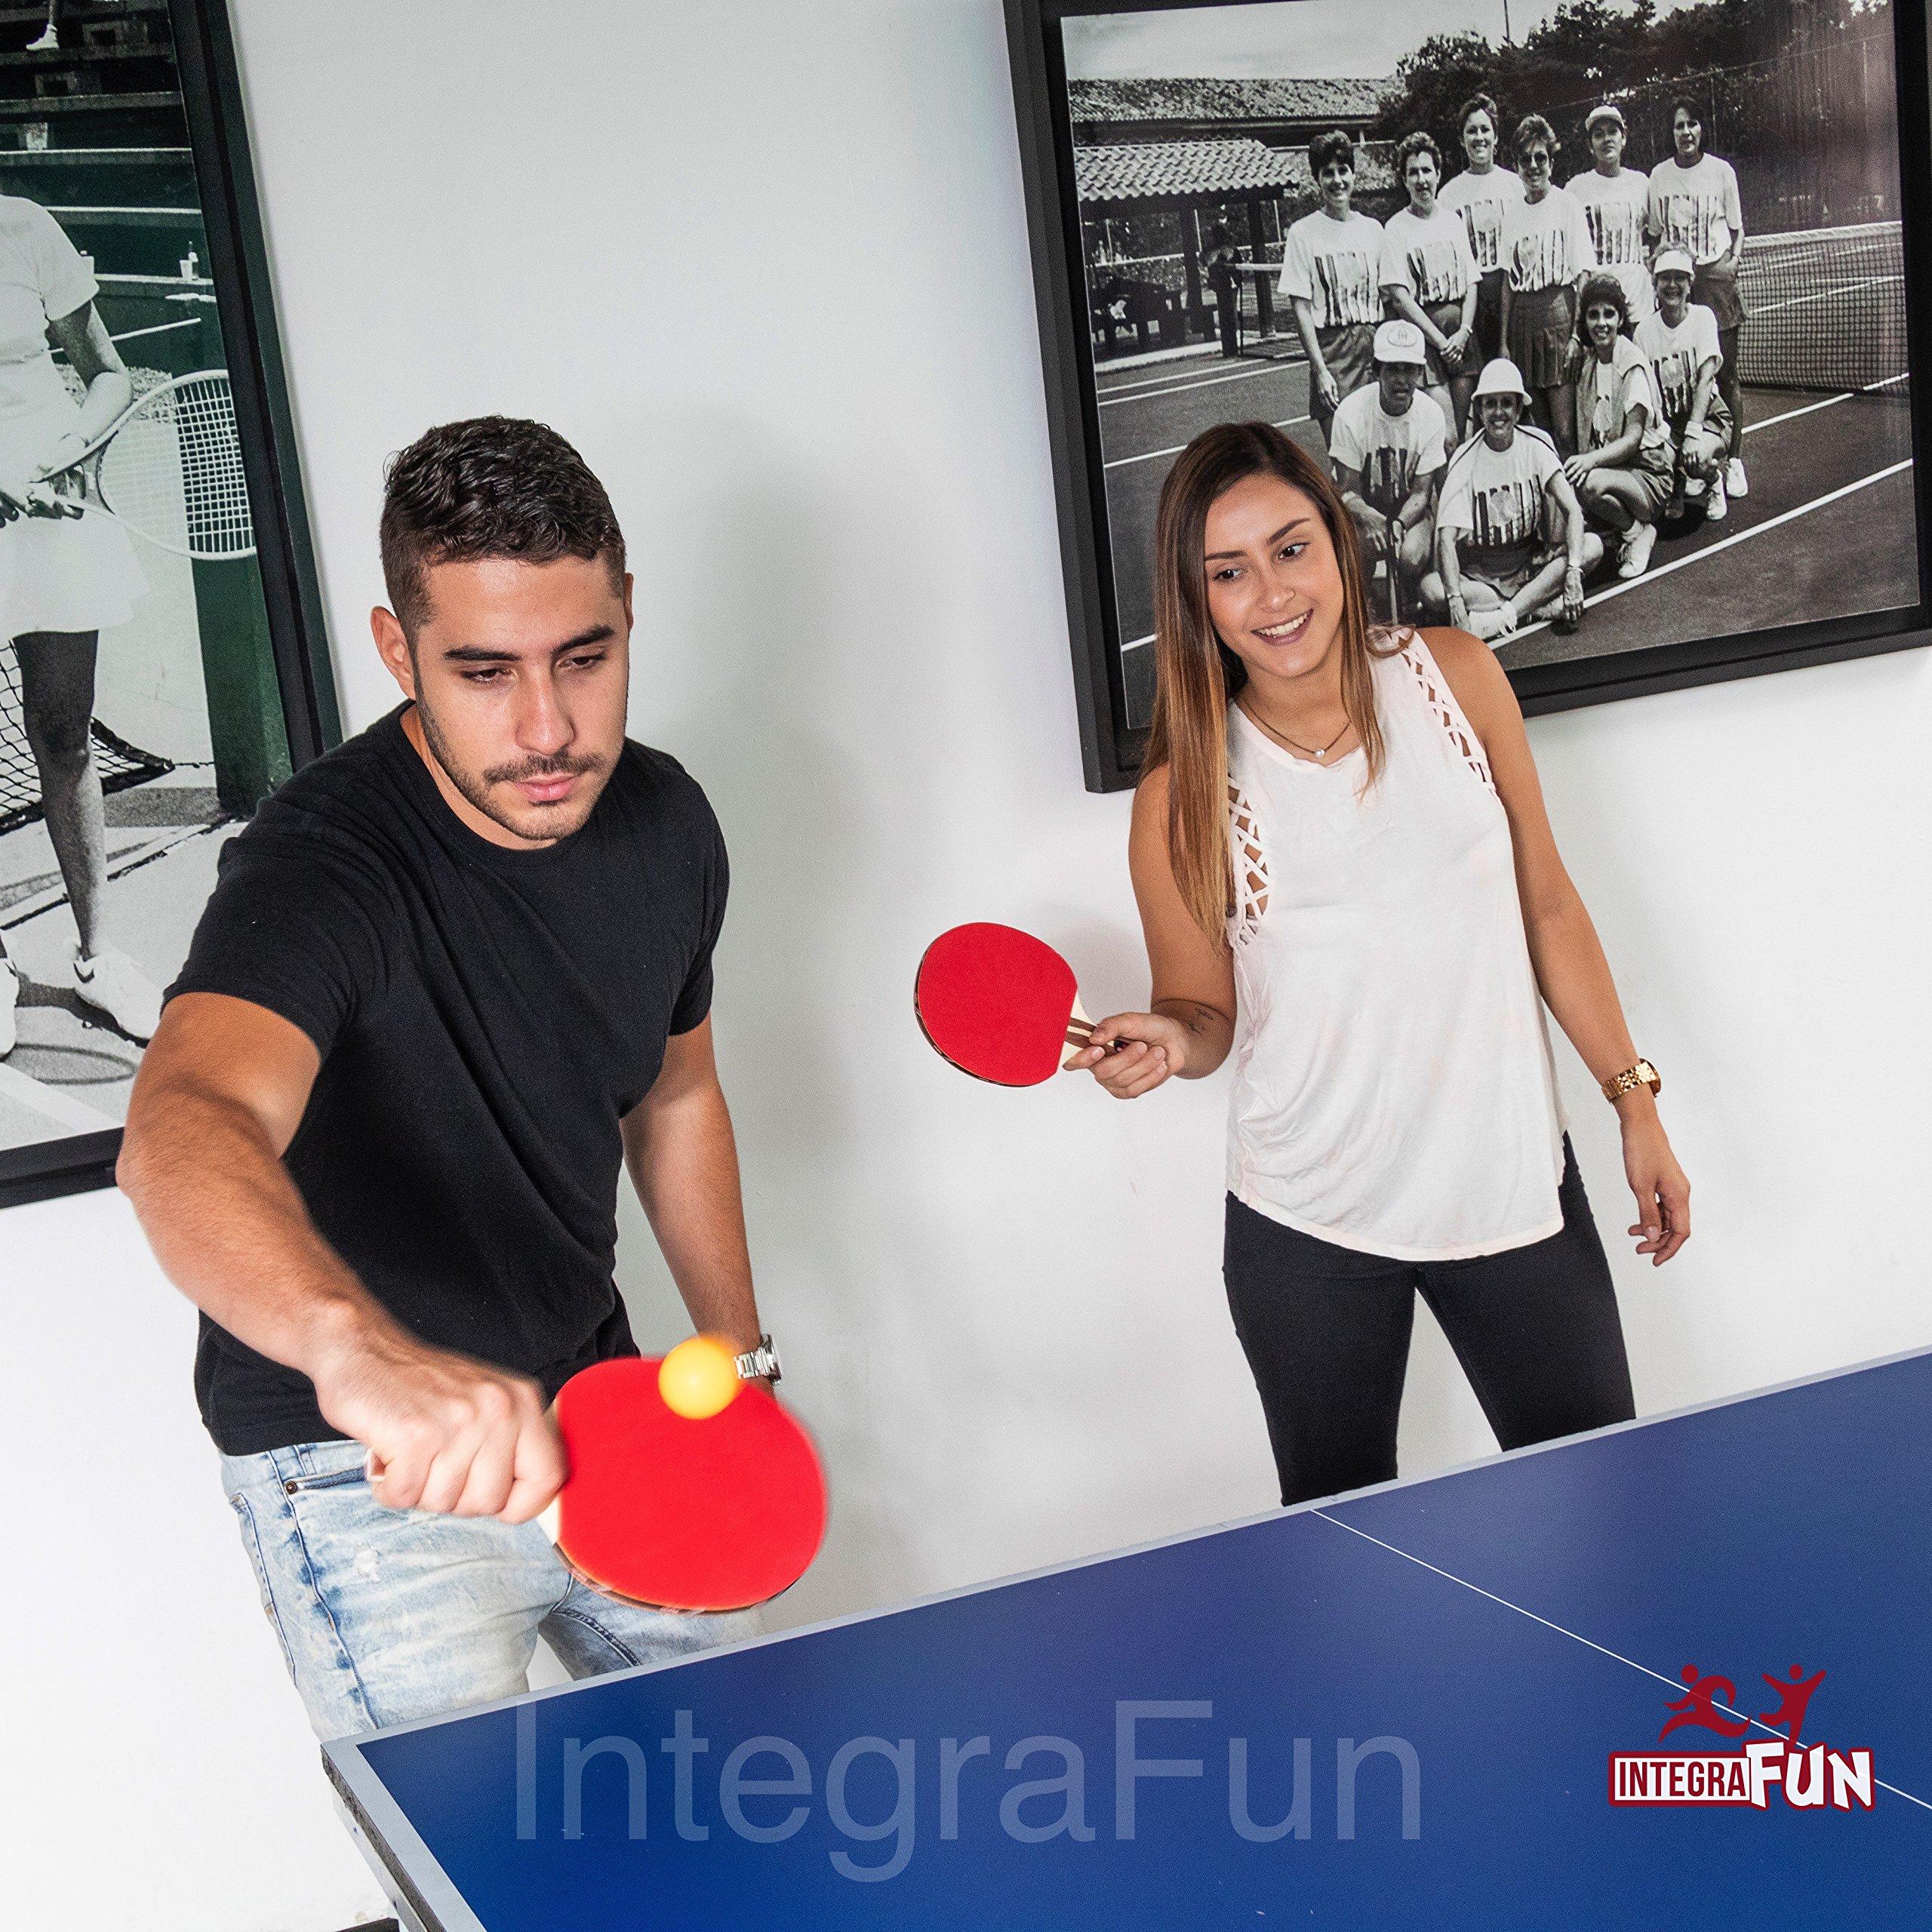 IntegraFun Ping Pong Paddle - 4 Player Table Tennis Racket Set - Eight 3-Star Balls - Ergonomic Grip - Paddle Case - Training Bat - Family Table Tennis - Portable Ping Pong Pack.